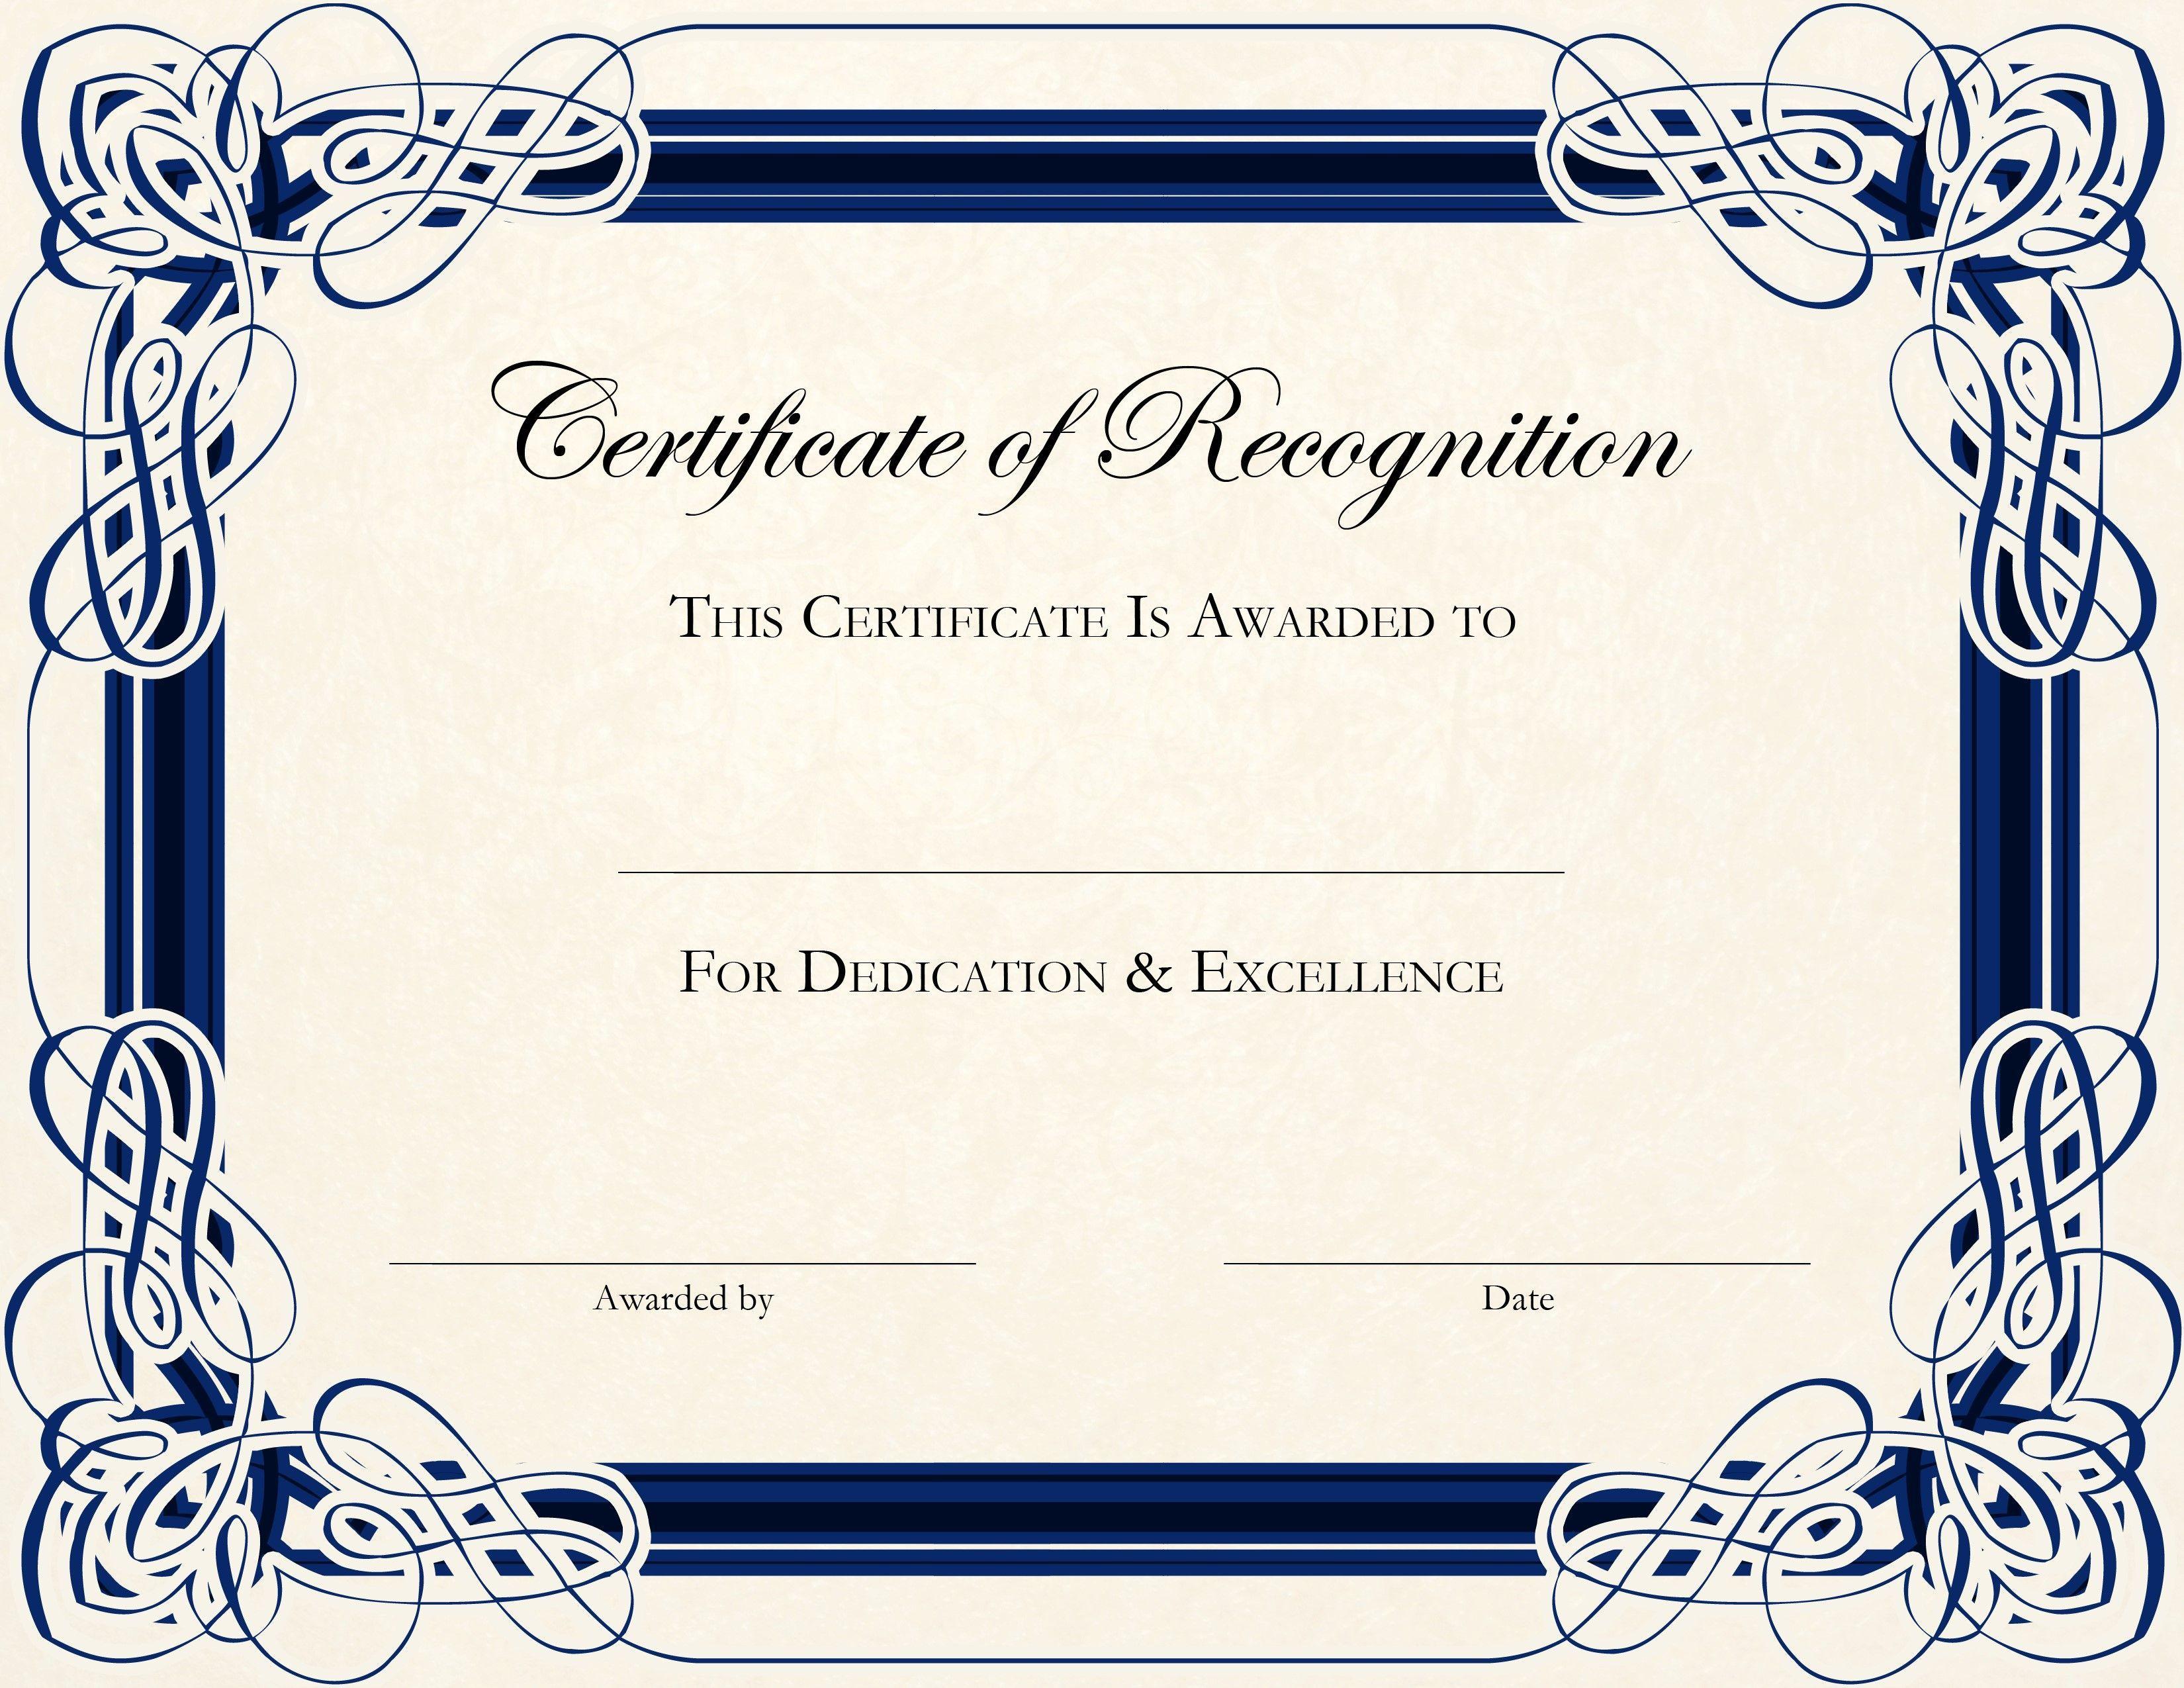 Image Result For Free Printable Award Certificate Template | Work - Free Printable Awards